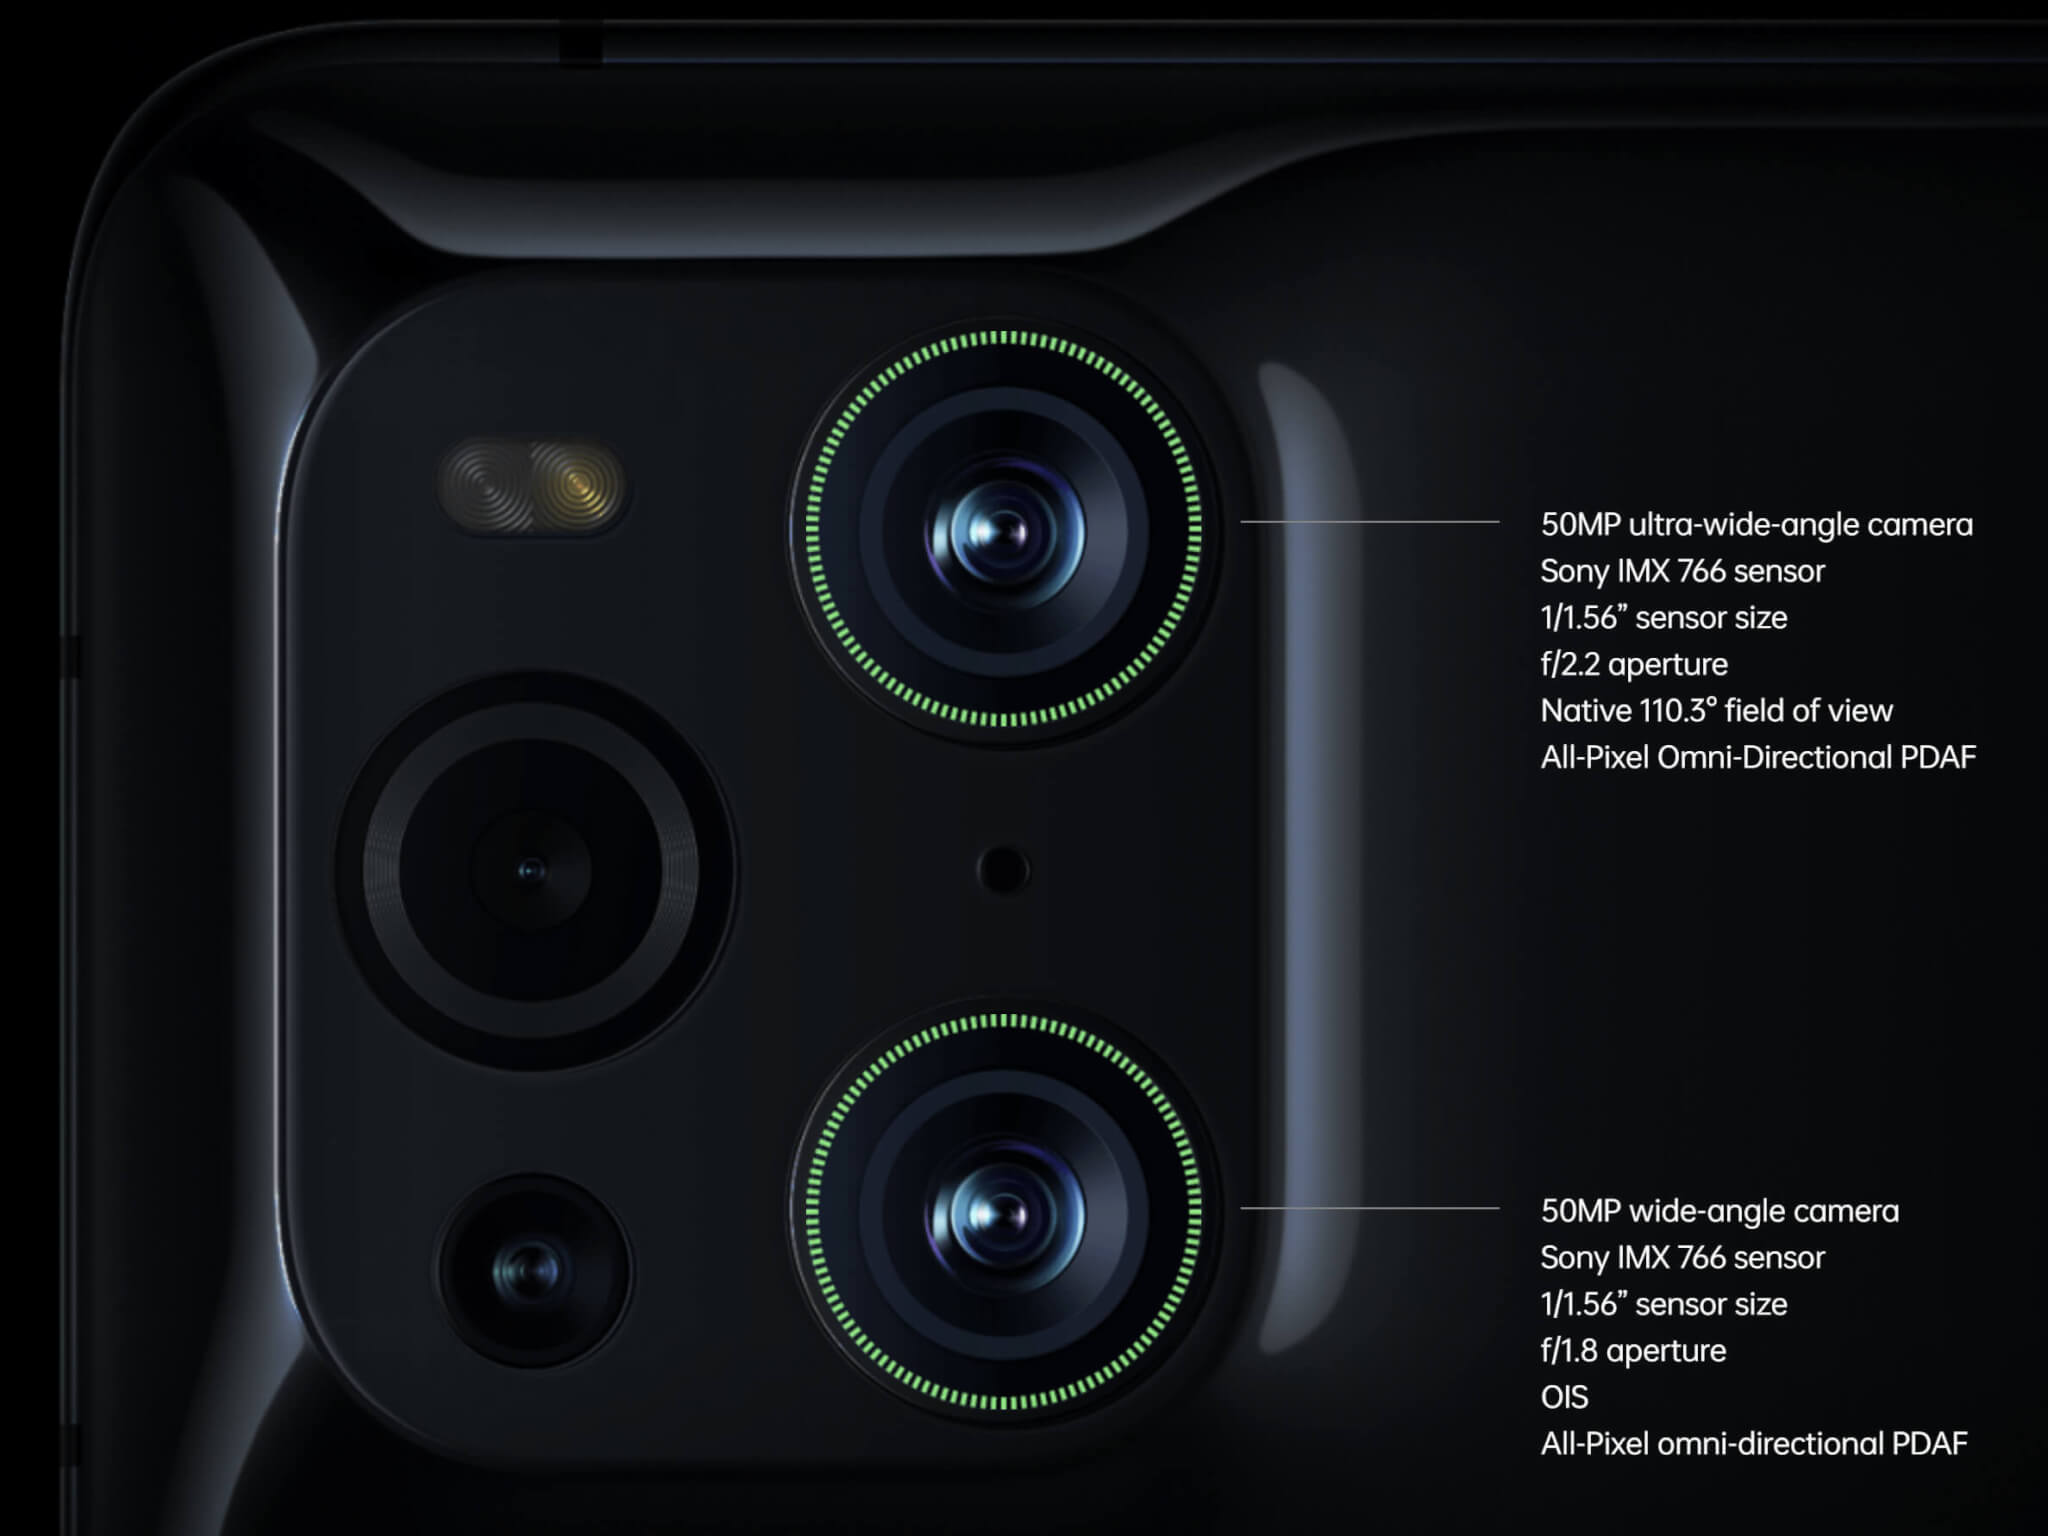 「OPPO Find X3 Pro」が搭載するIMX766センサーはソニーとの共同開発